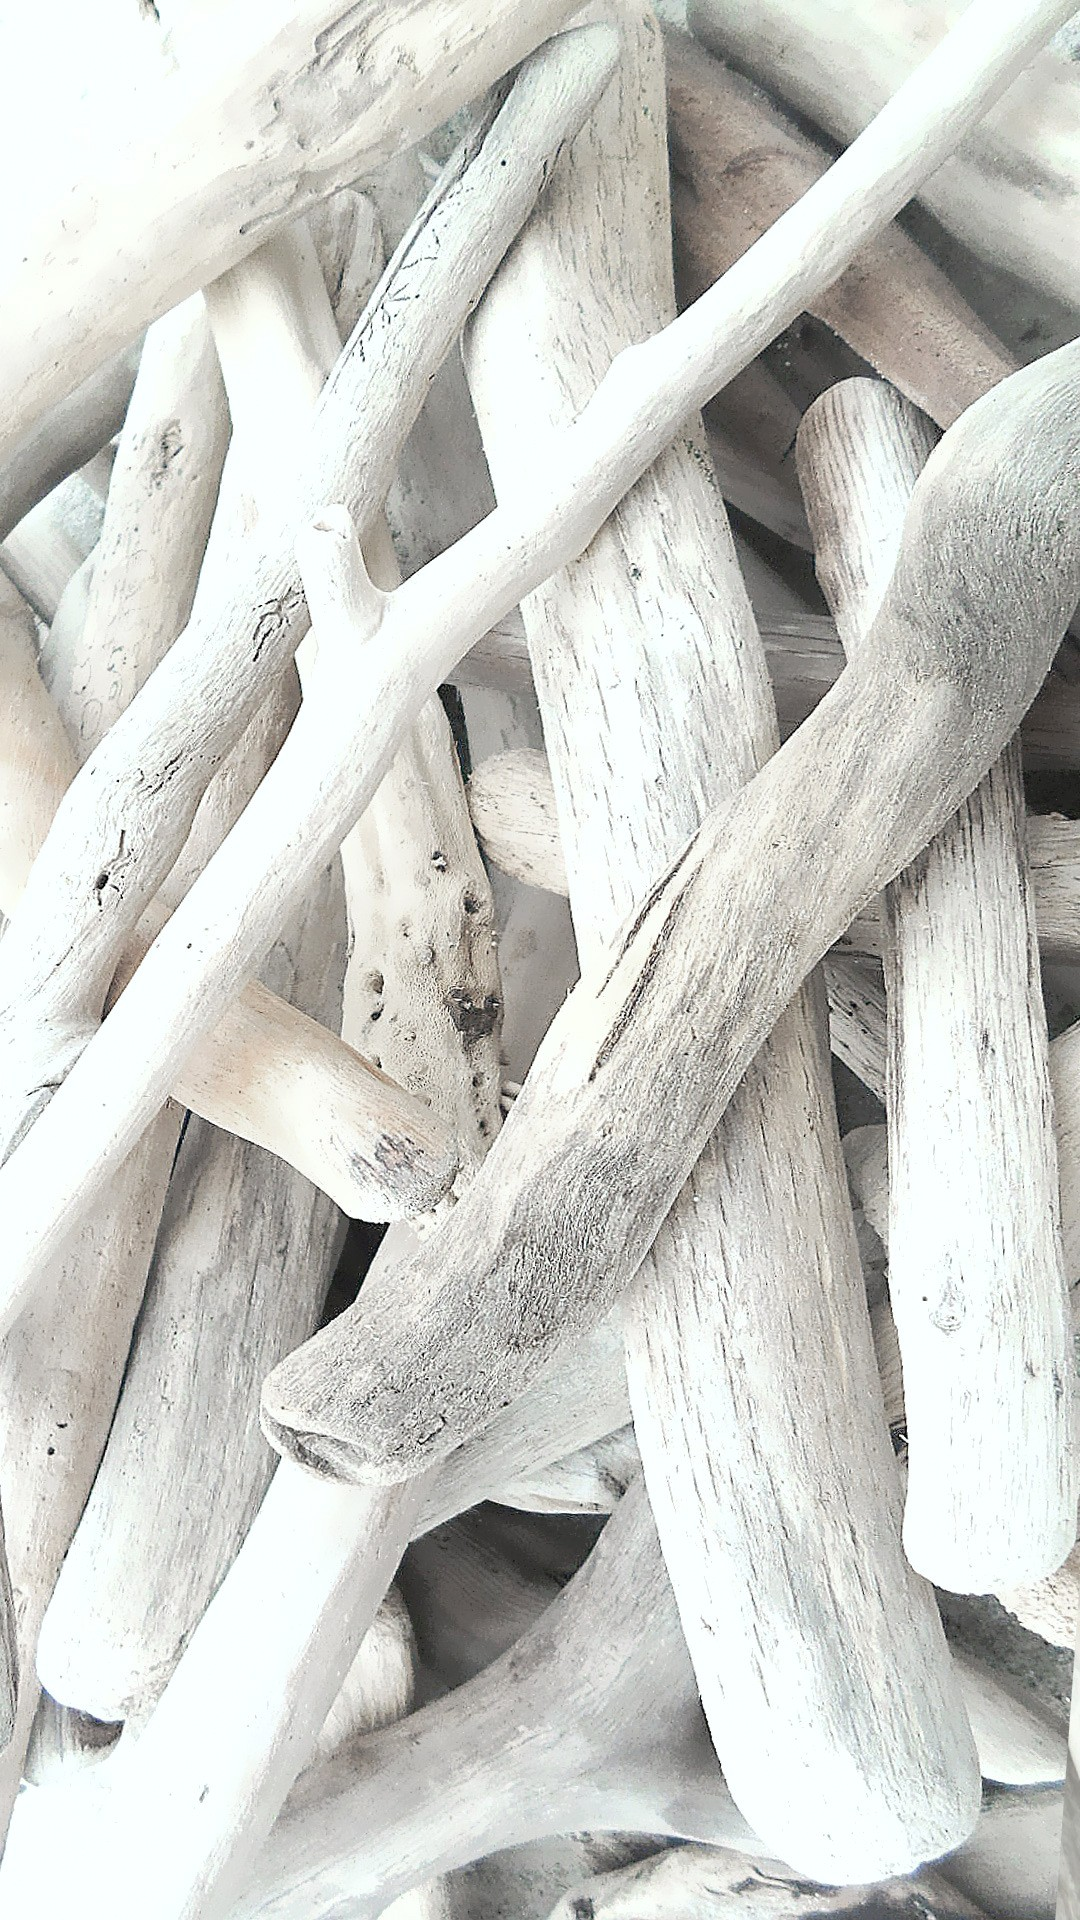 Créations En Bois Flotté driftwood long, driftwood for various creations and unusual